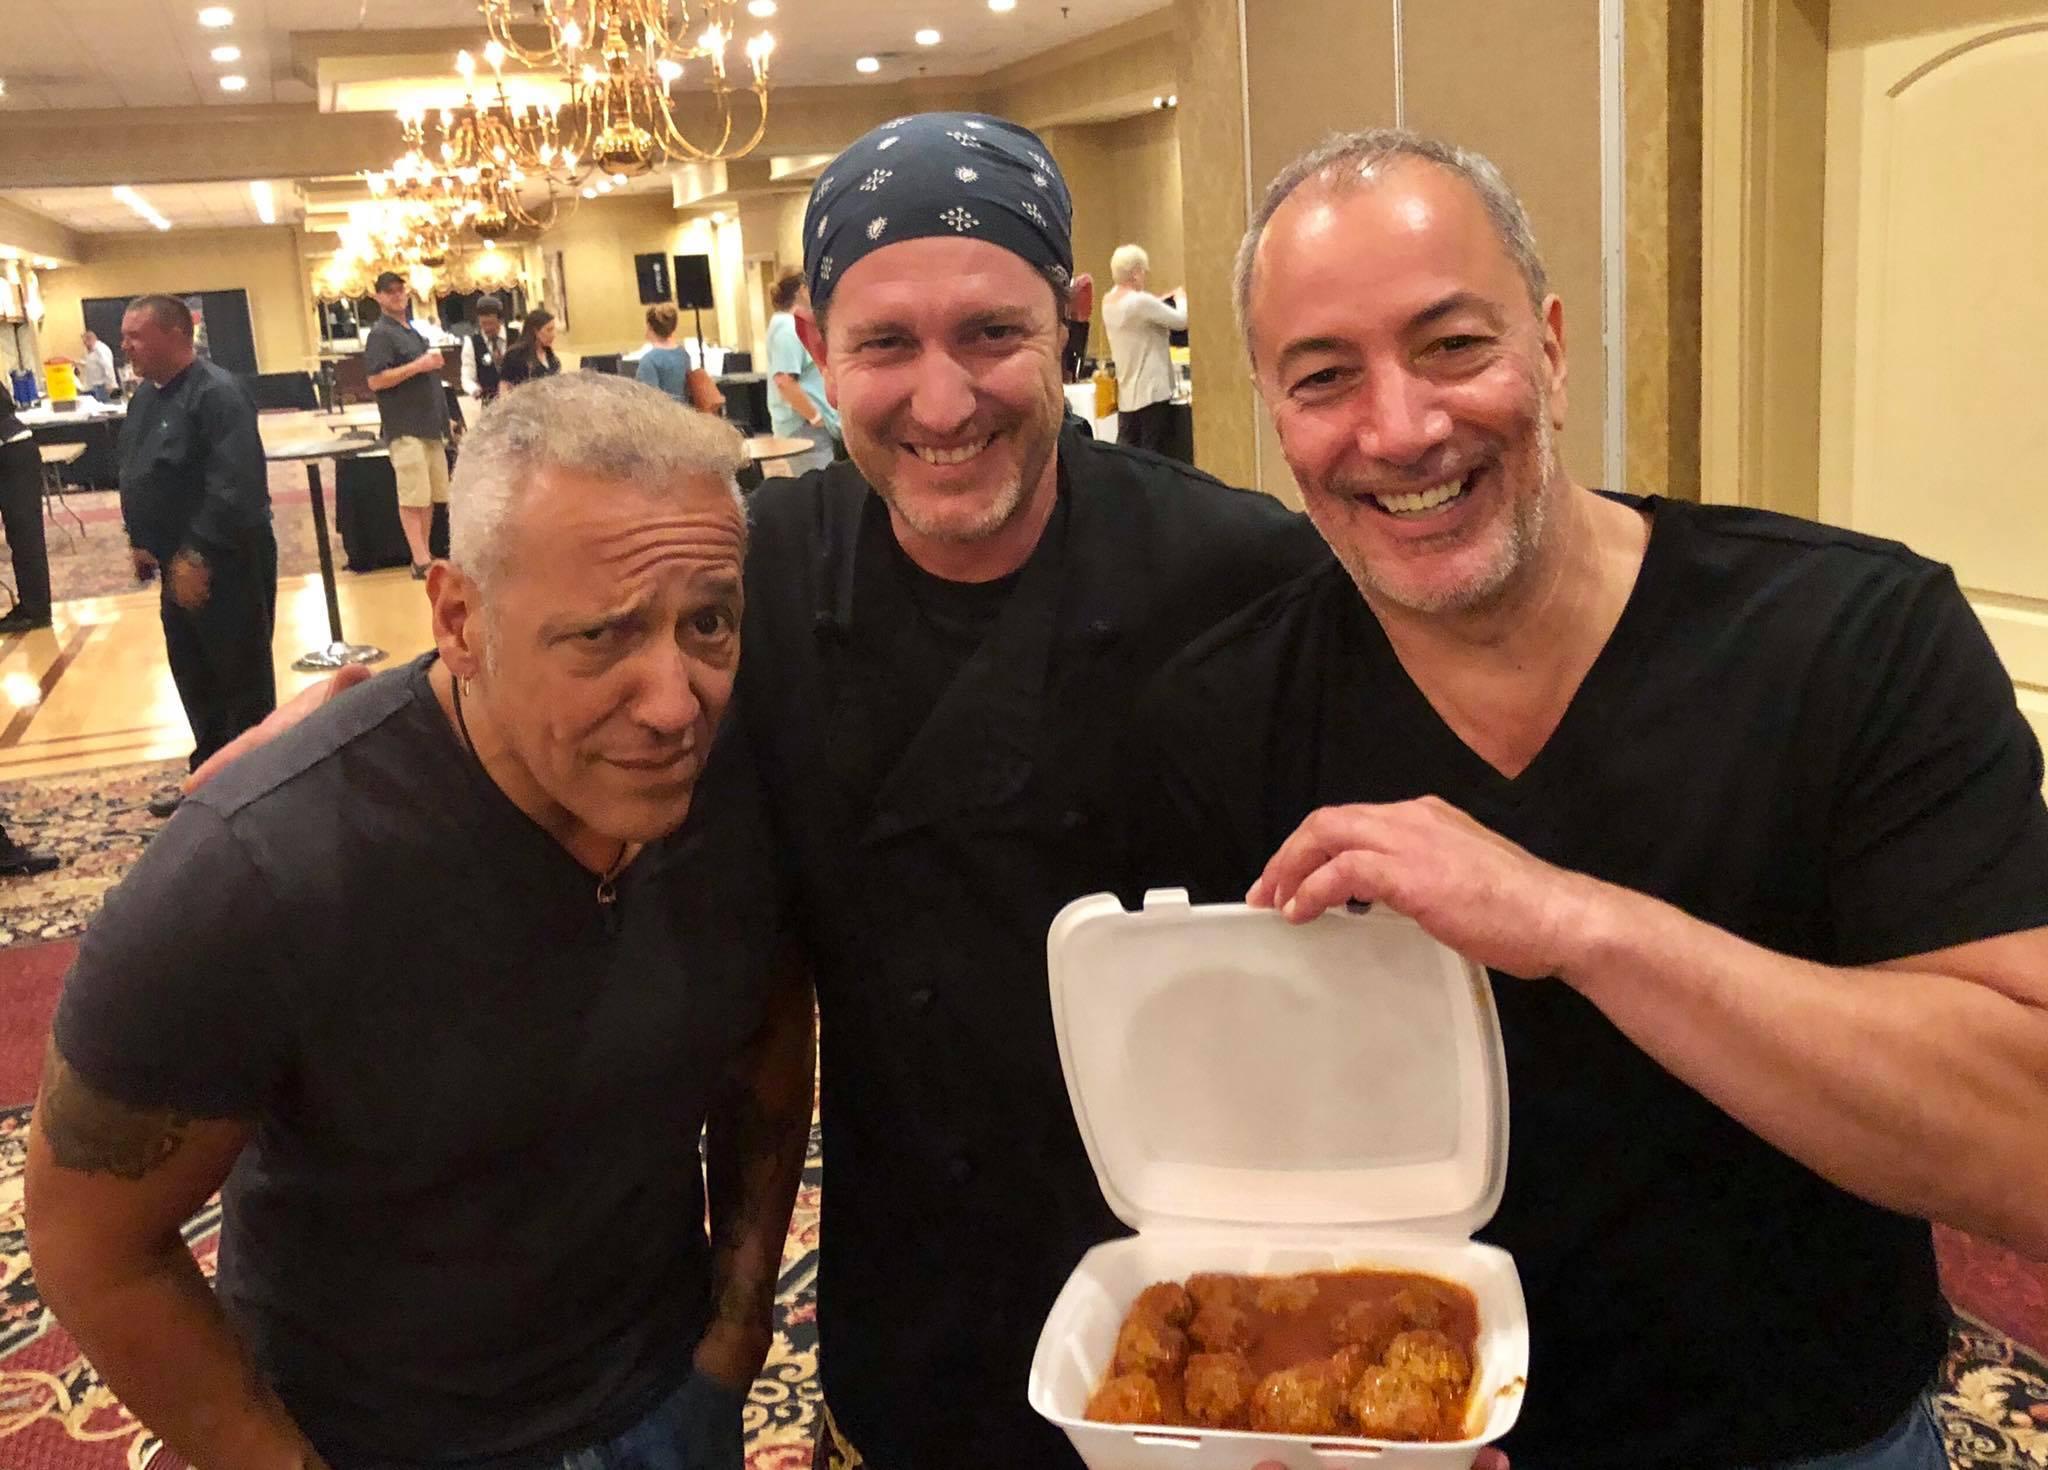 Chaz and AJ Food Fest 9/26/19